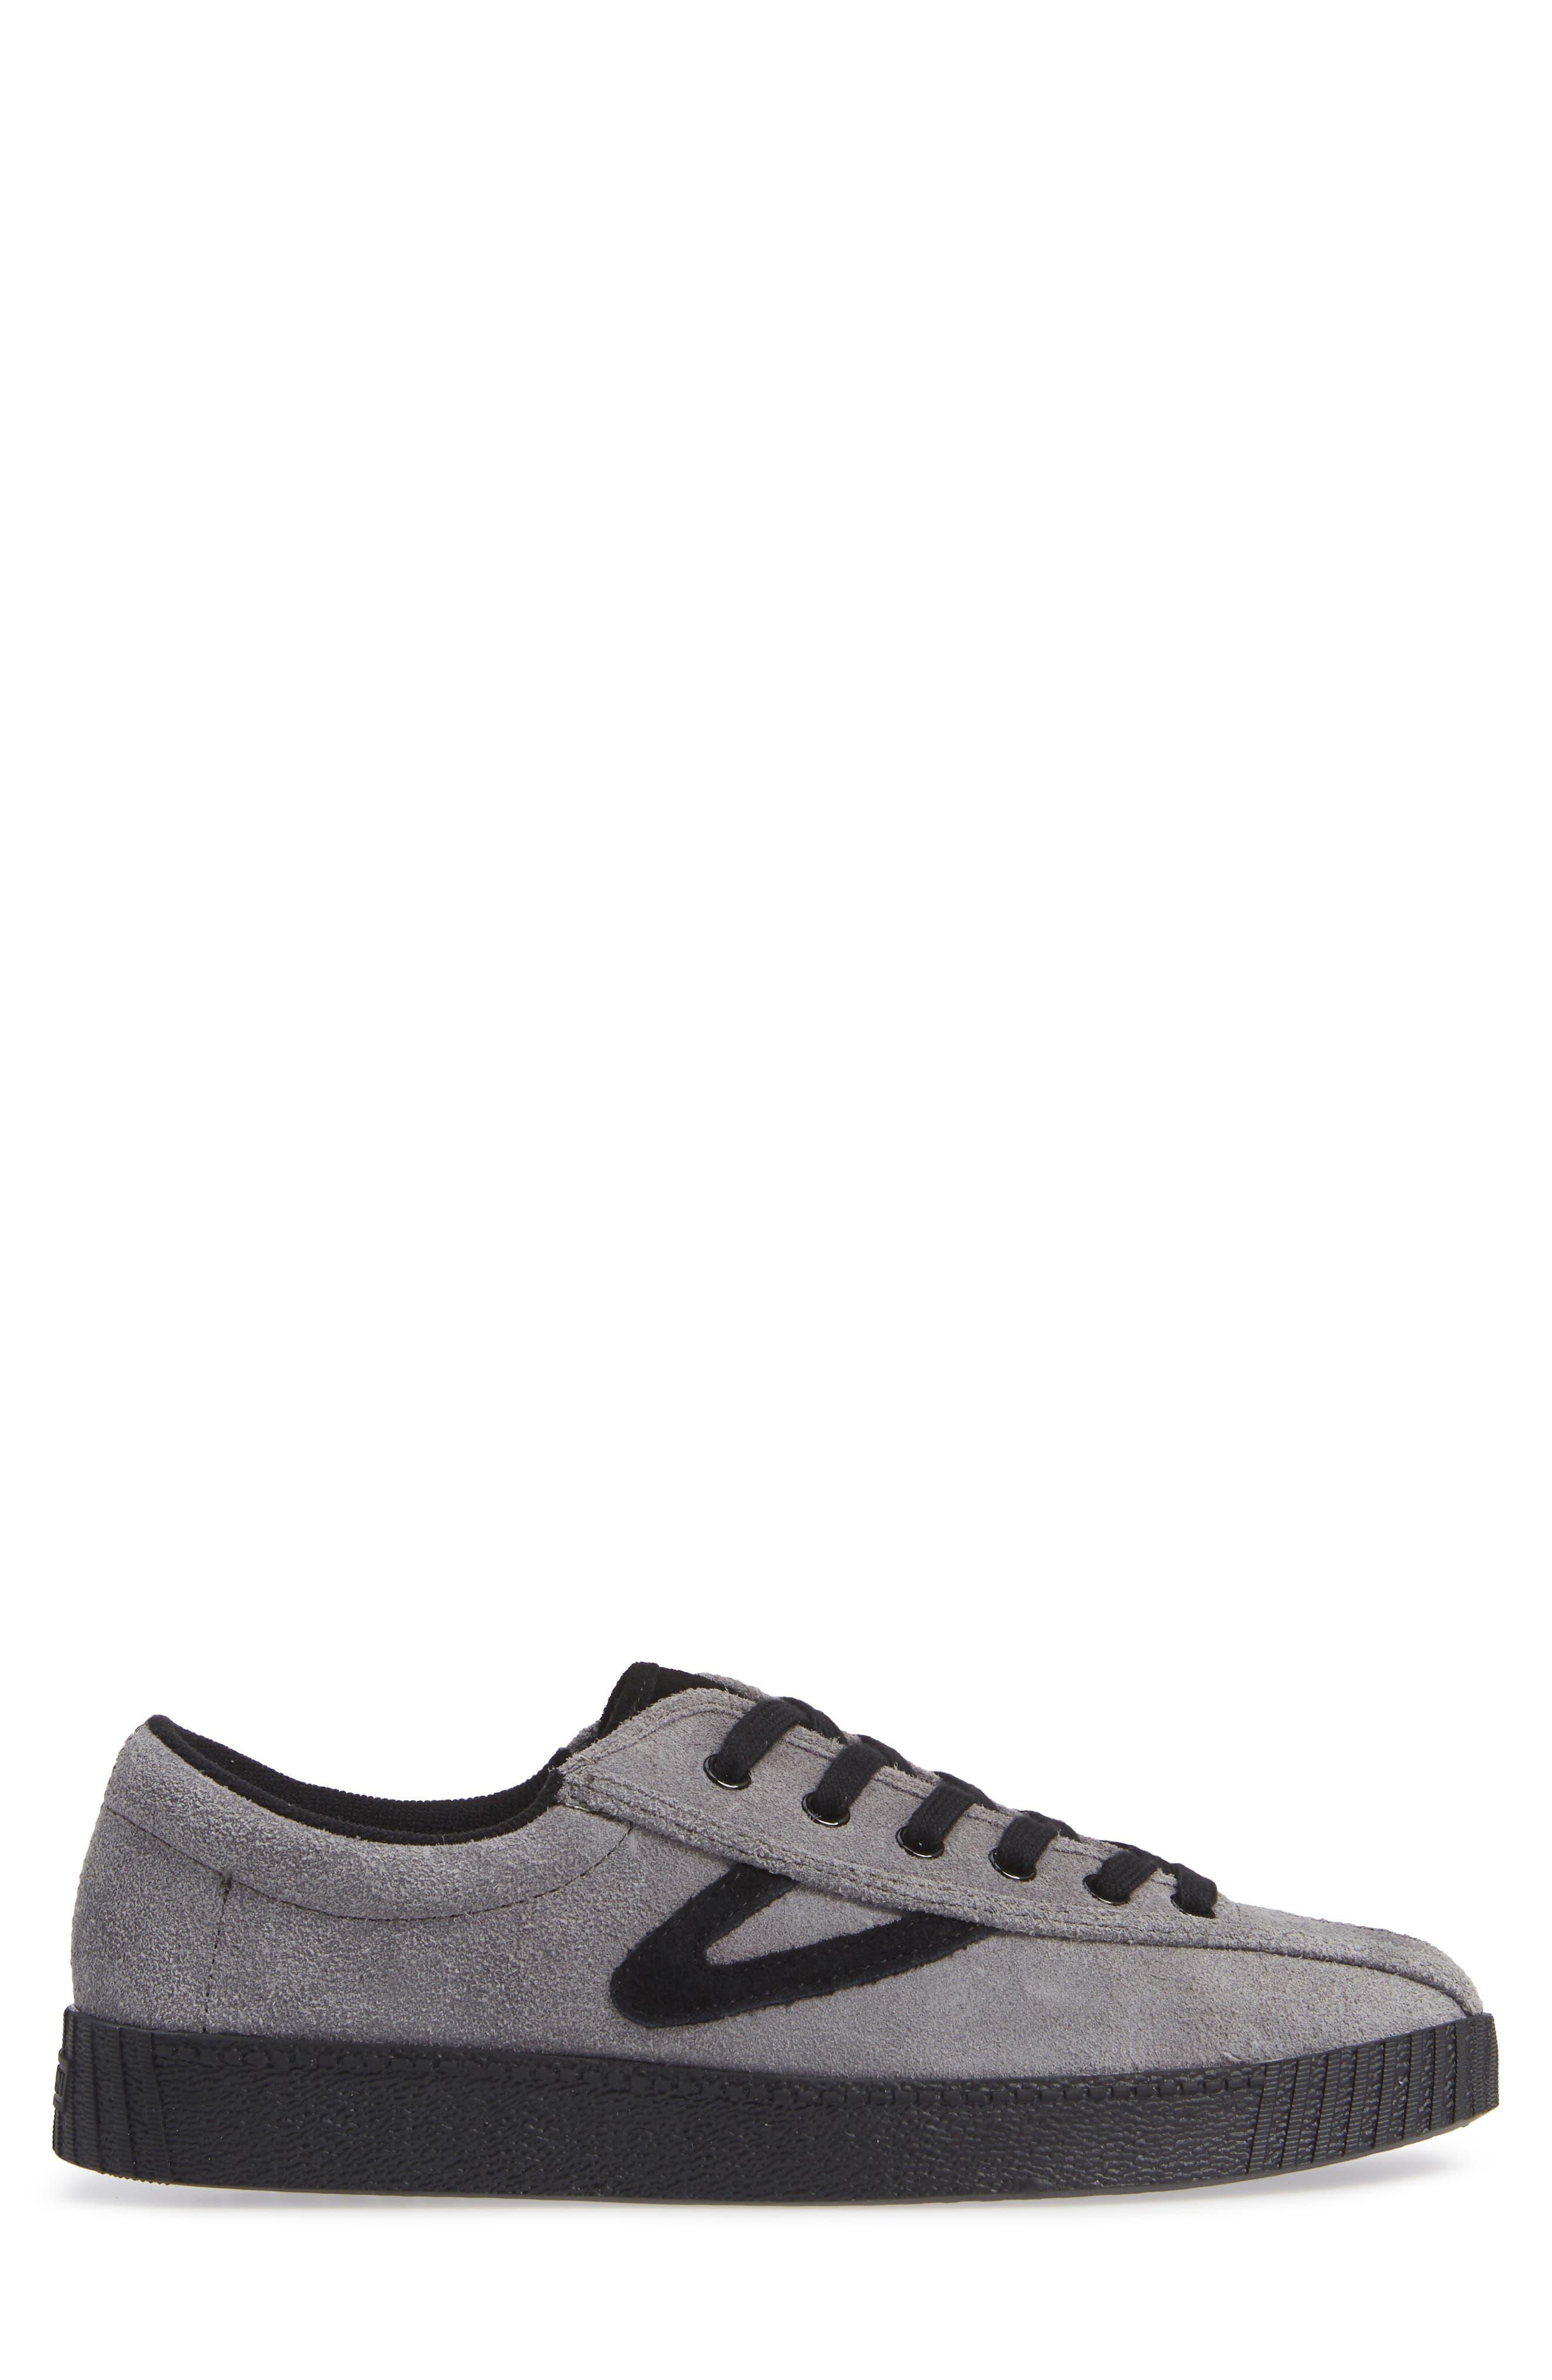 Nylite26Plus Sneaker,                             Alternate thumbnail 3, color,                             GRAPHITE SUEDE